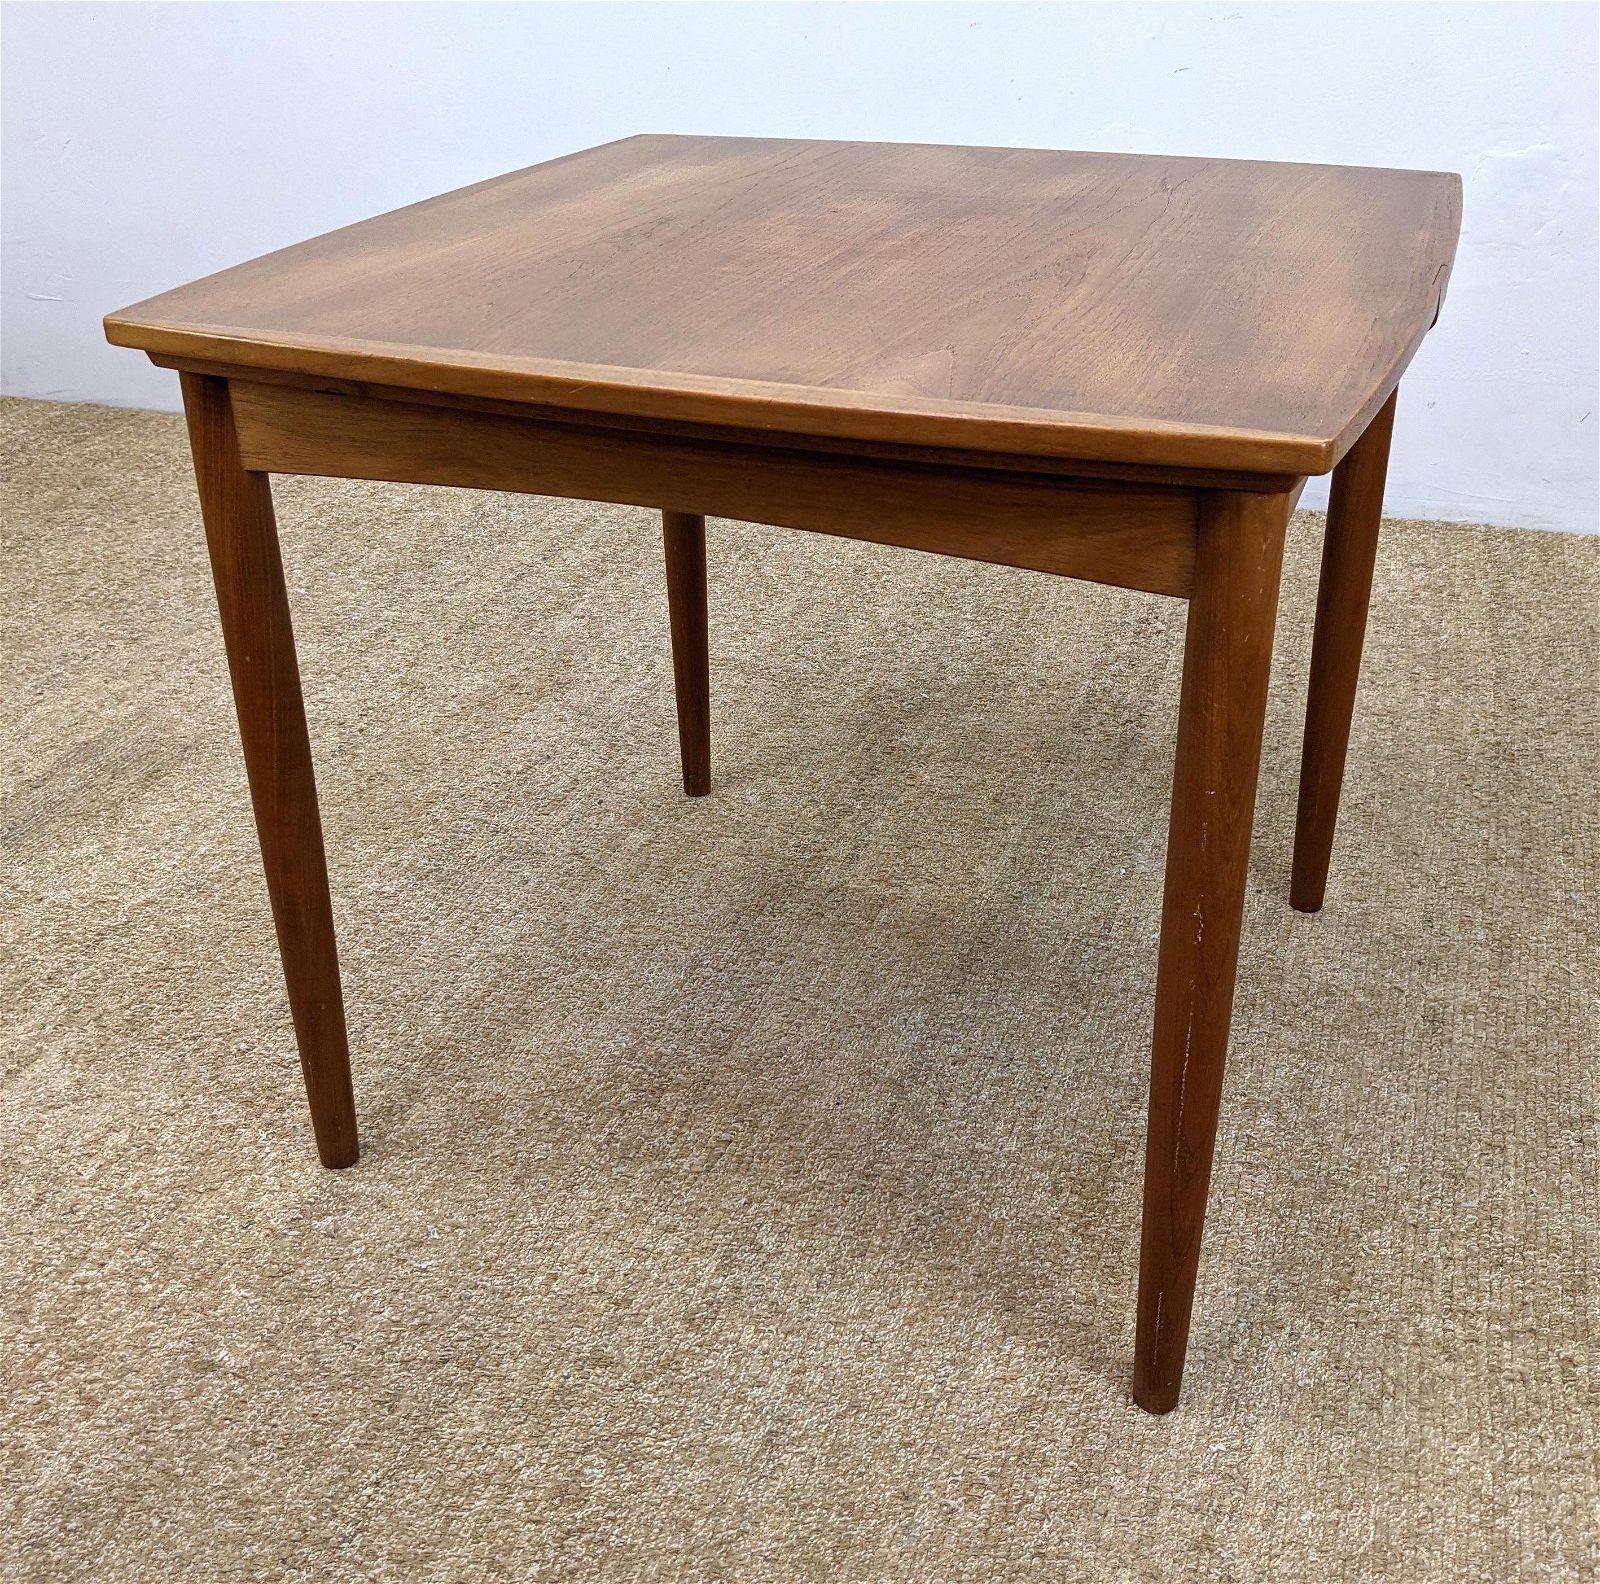 Danish Modern Teak Refractory Dining Table. Game Table.